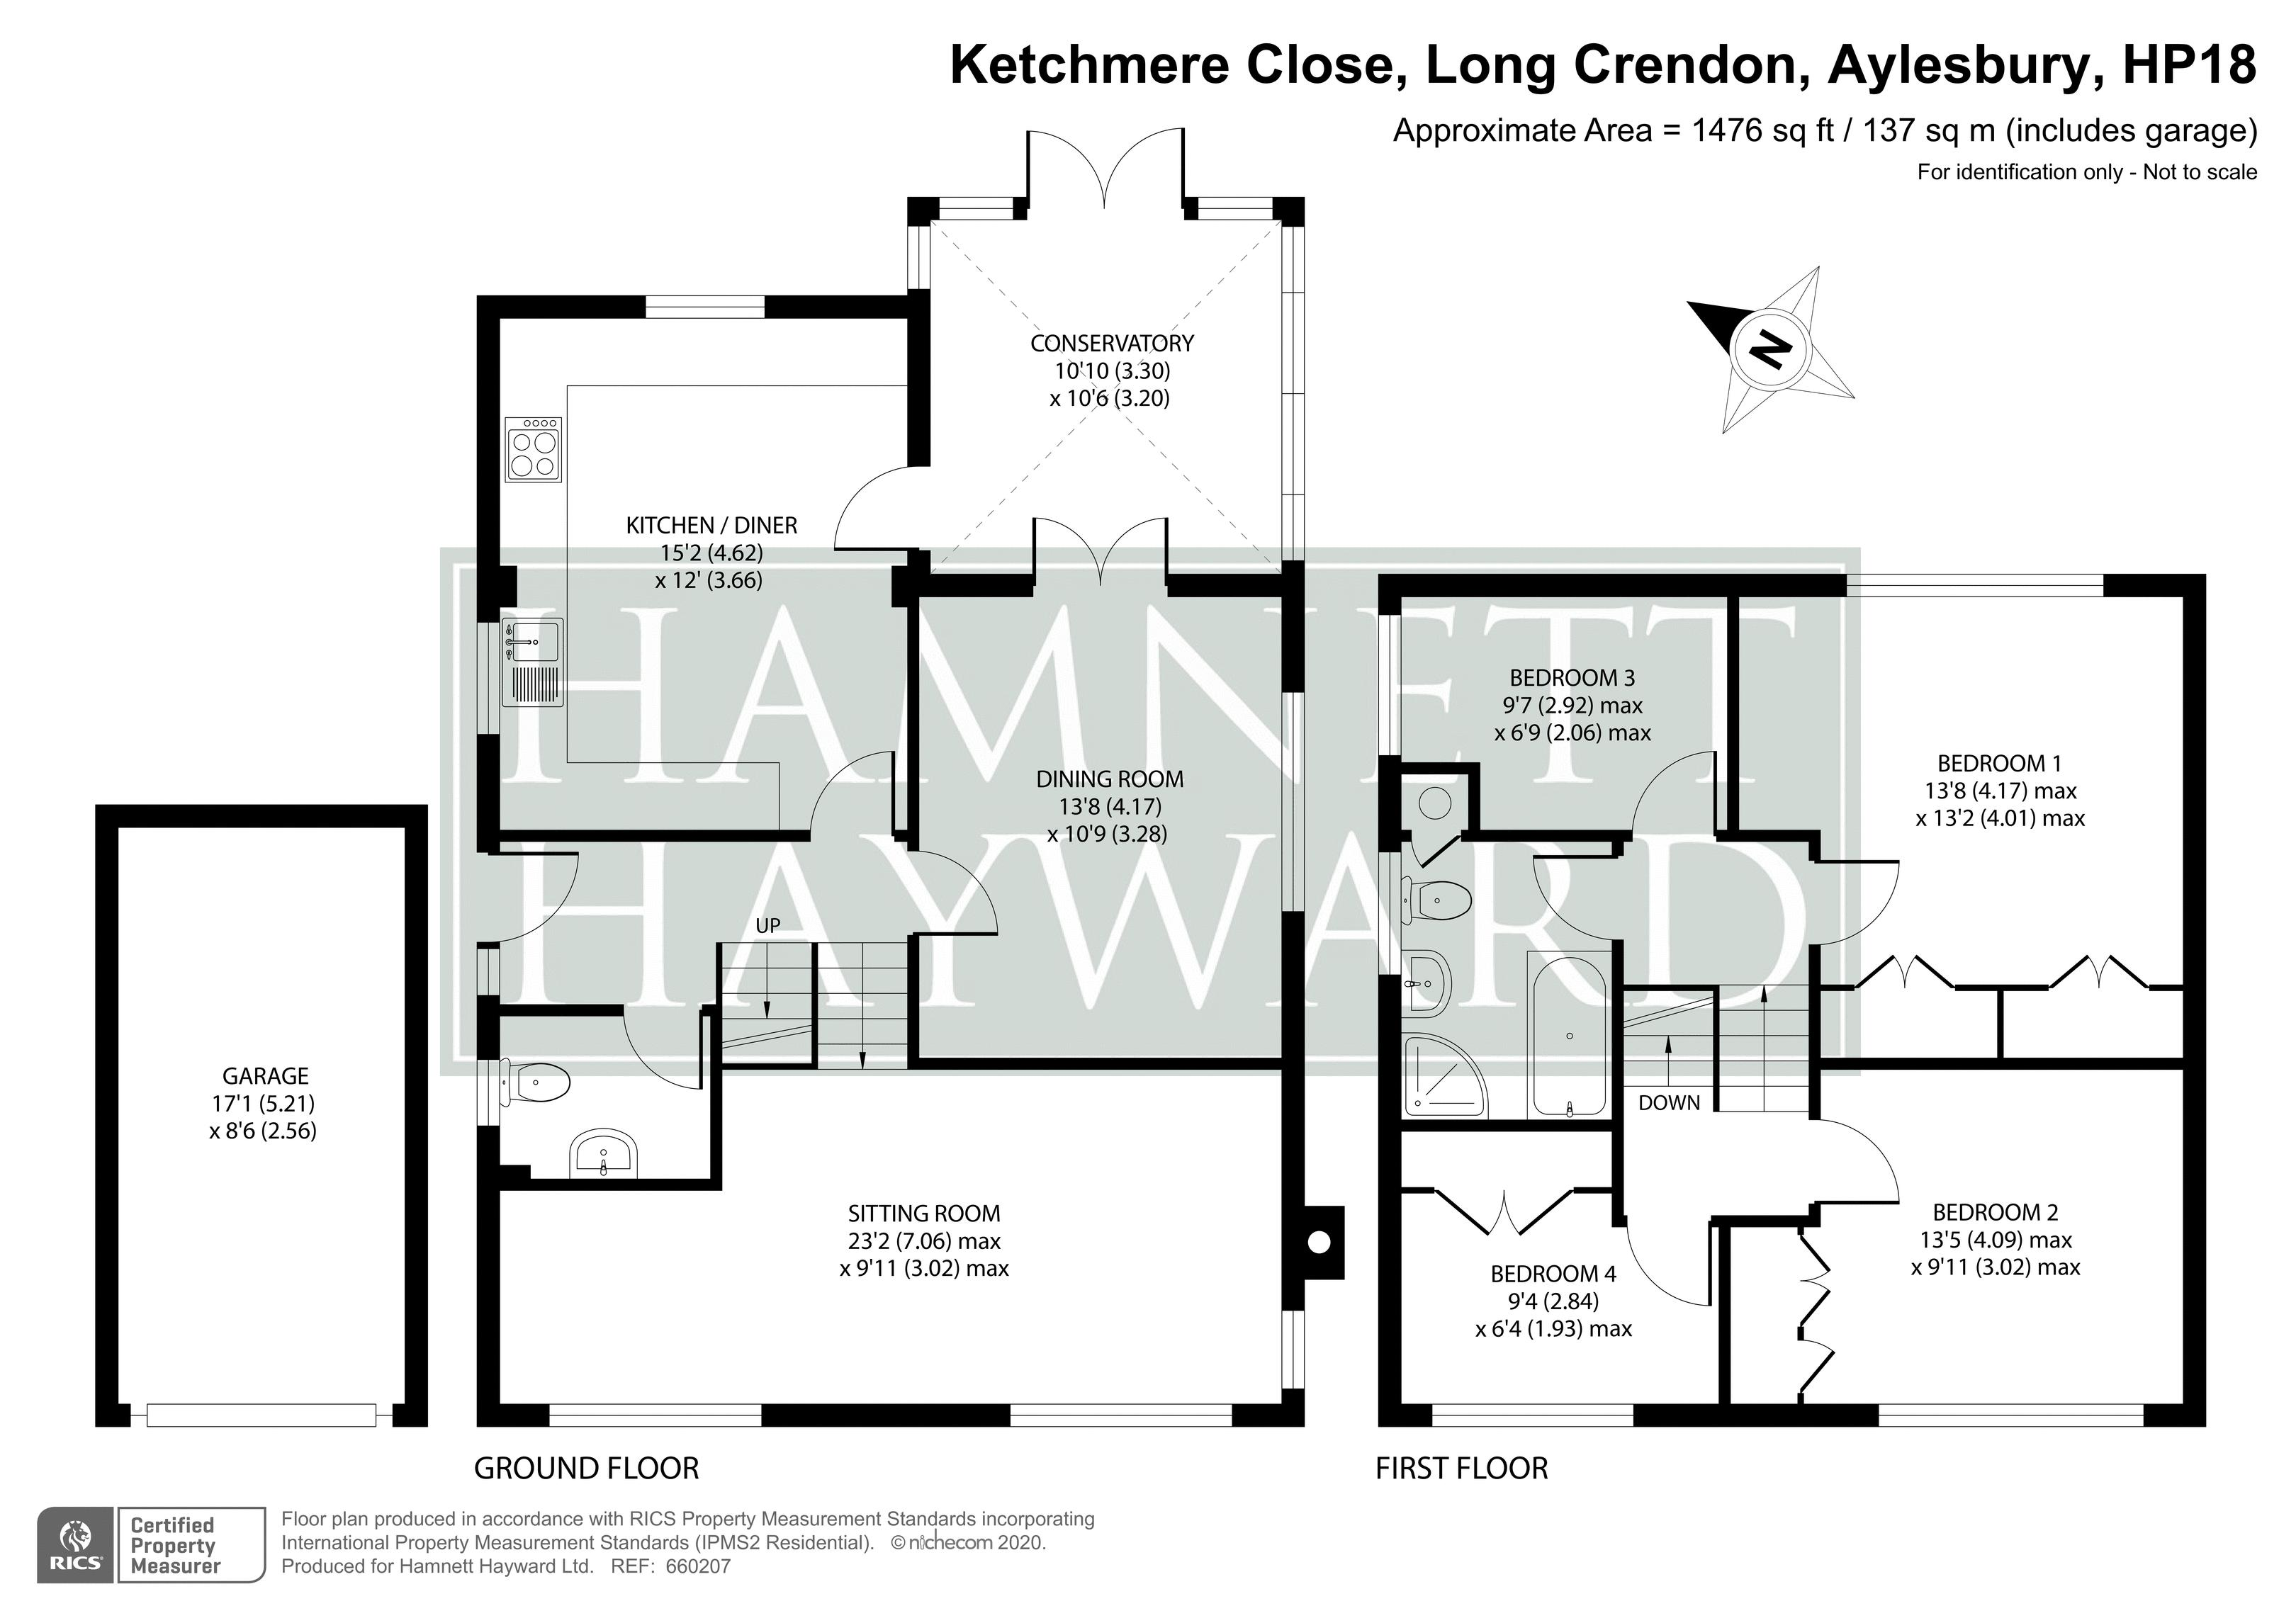 Ketchmere Close Long Crendon